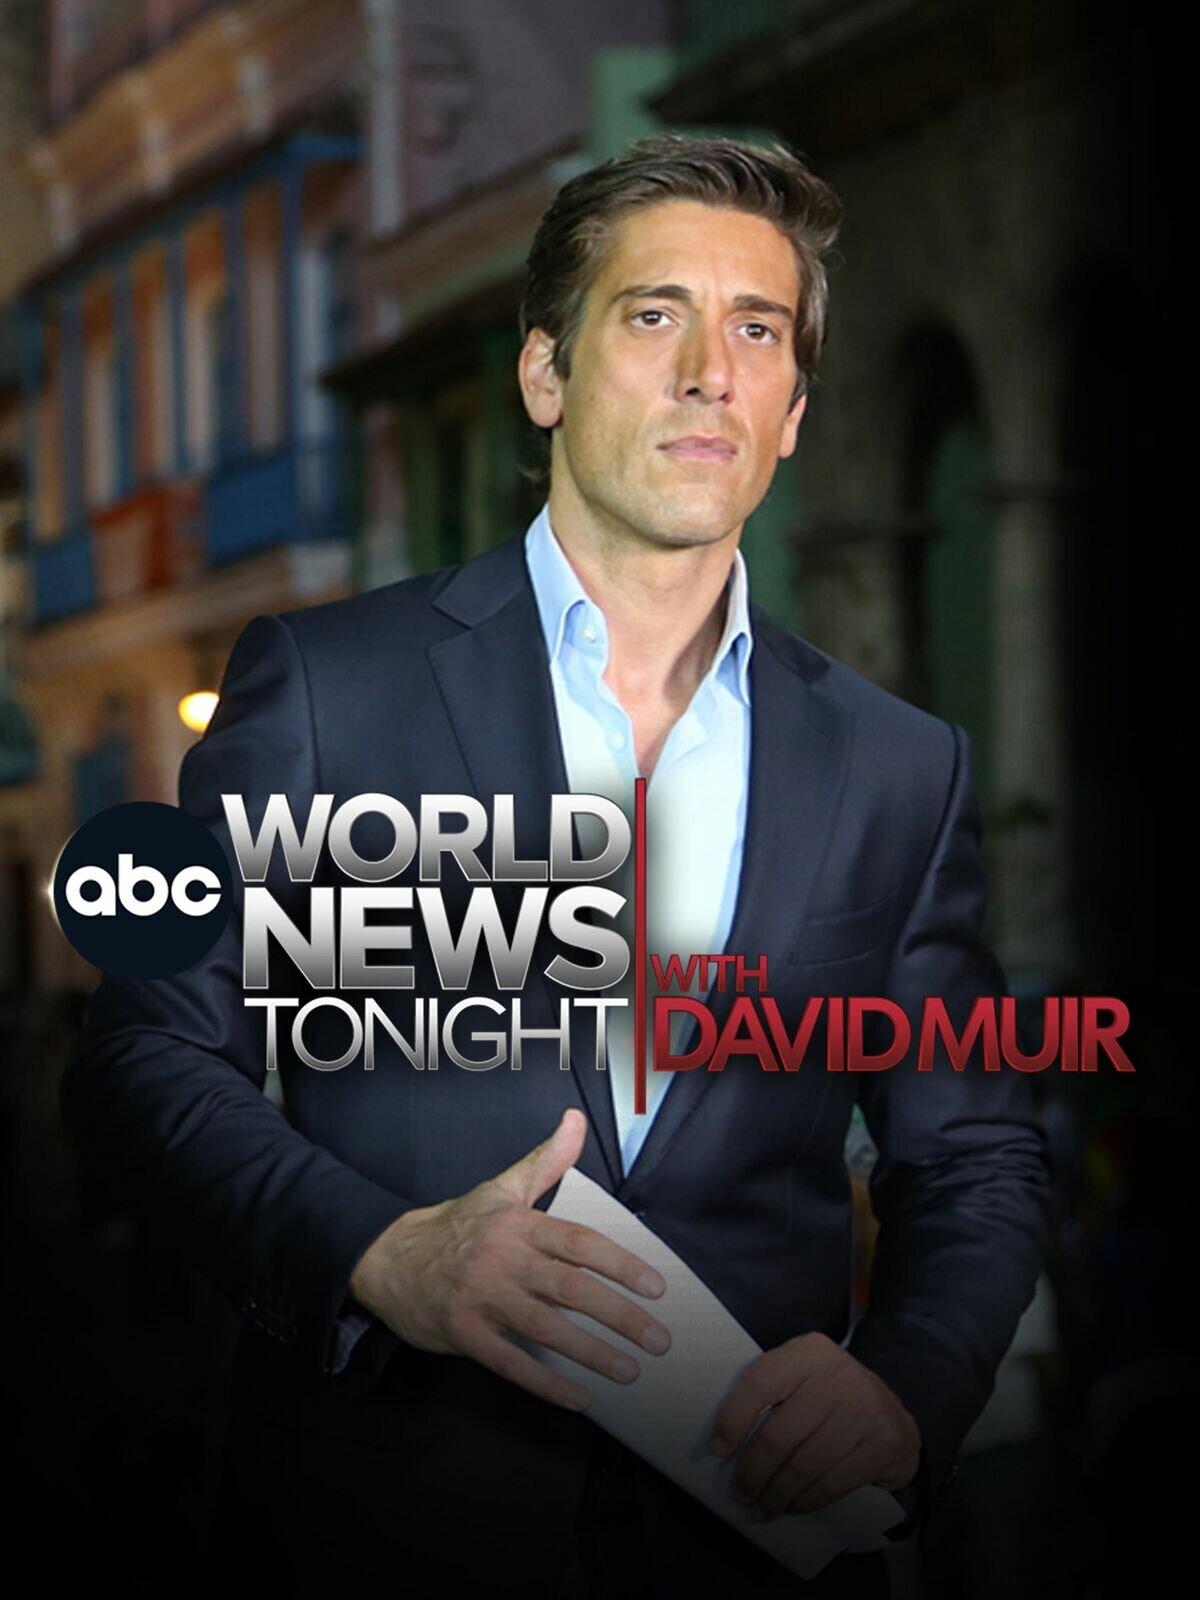 ABC World News Tonight with David Muir ne zaman